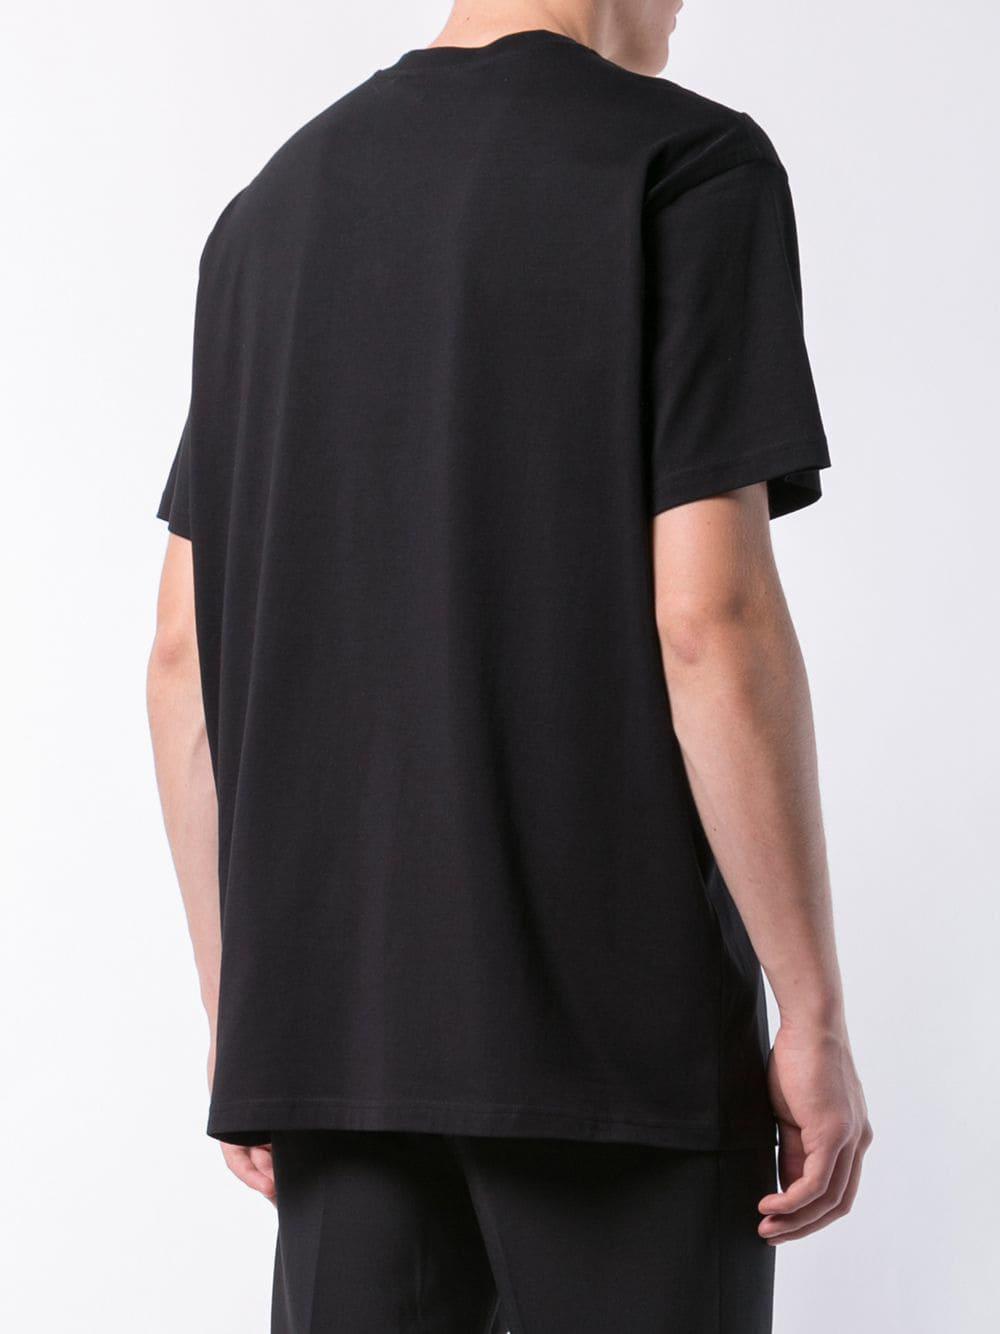 26a6675c Lyst - Givenchy Centaur Print T-shirt in Black for Men